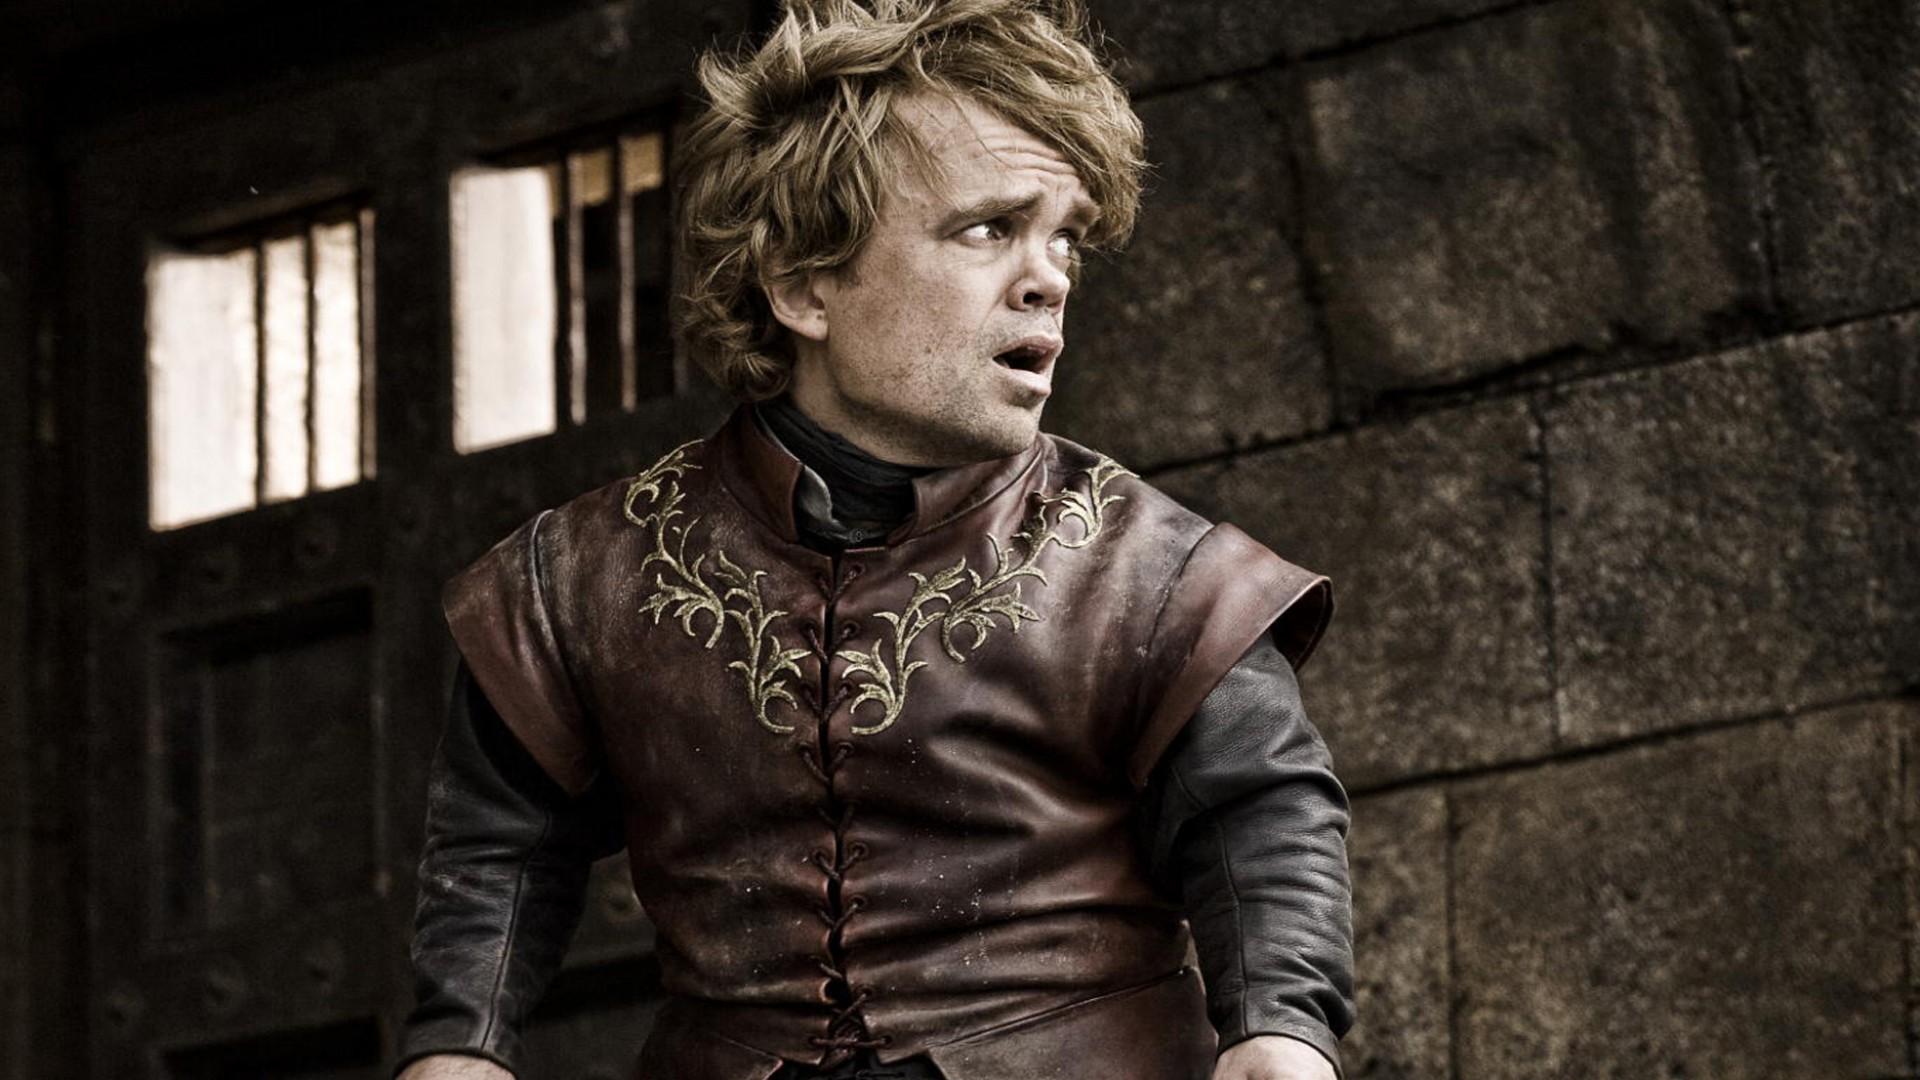 ... Peter Dinklage Game Of Thrones Wallpapers5 ...